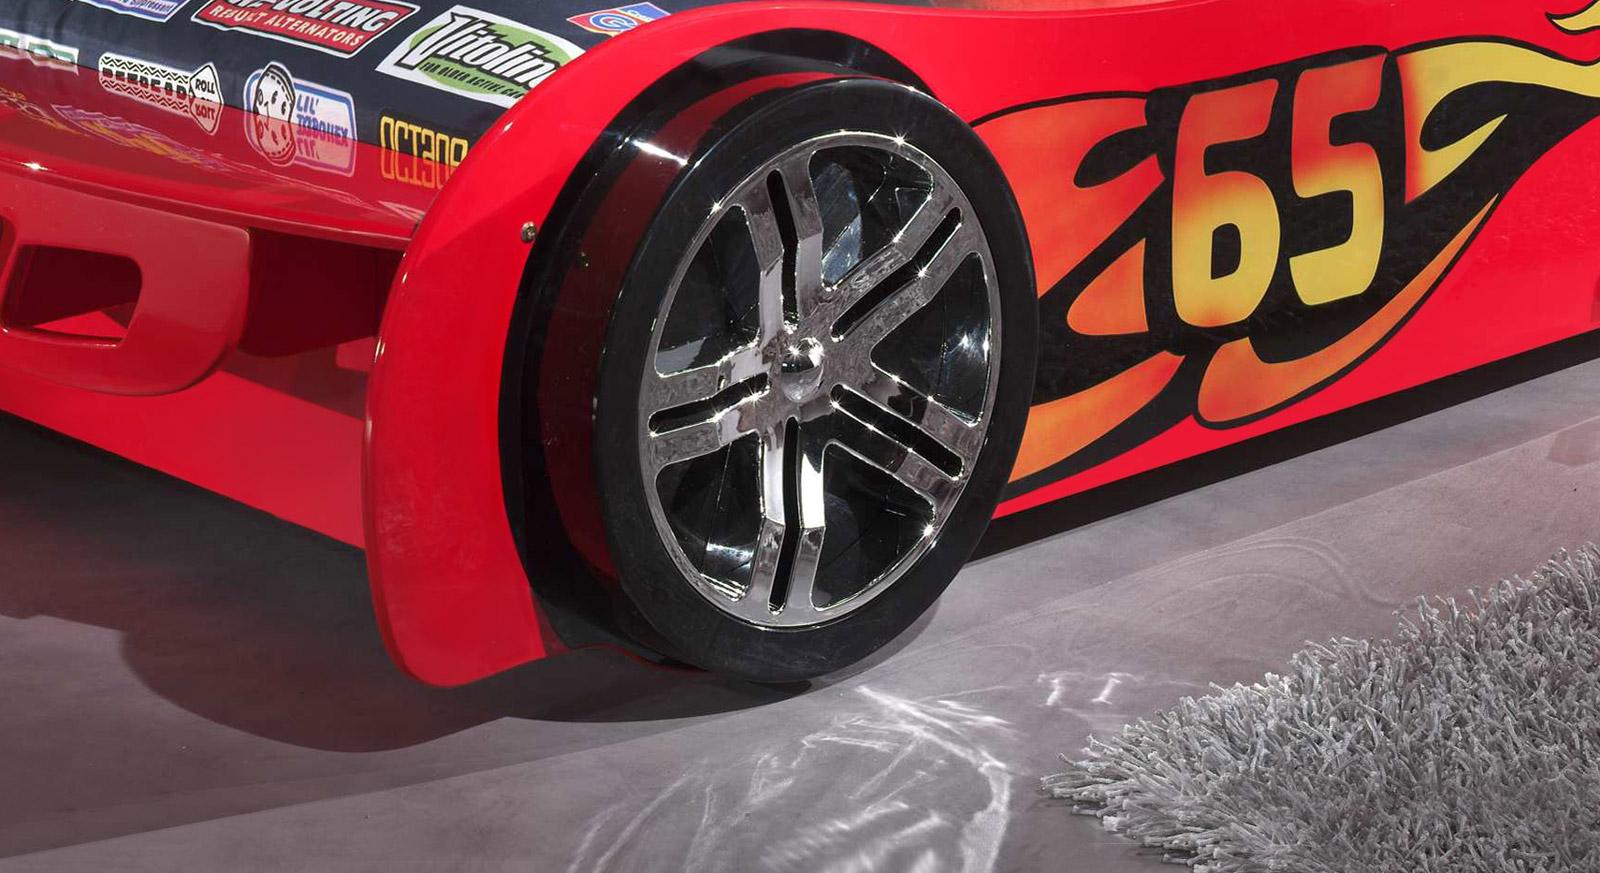 Autobett Tuning rot mit Alufelgen-Nachbildung an den Reifen